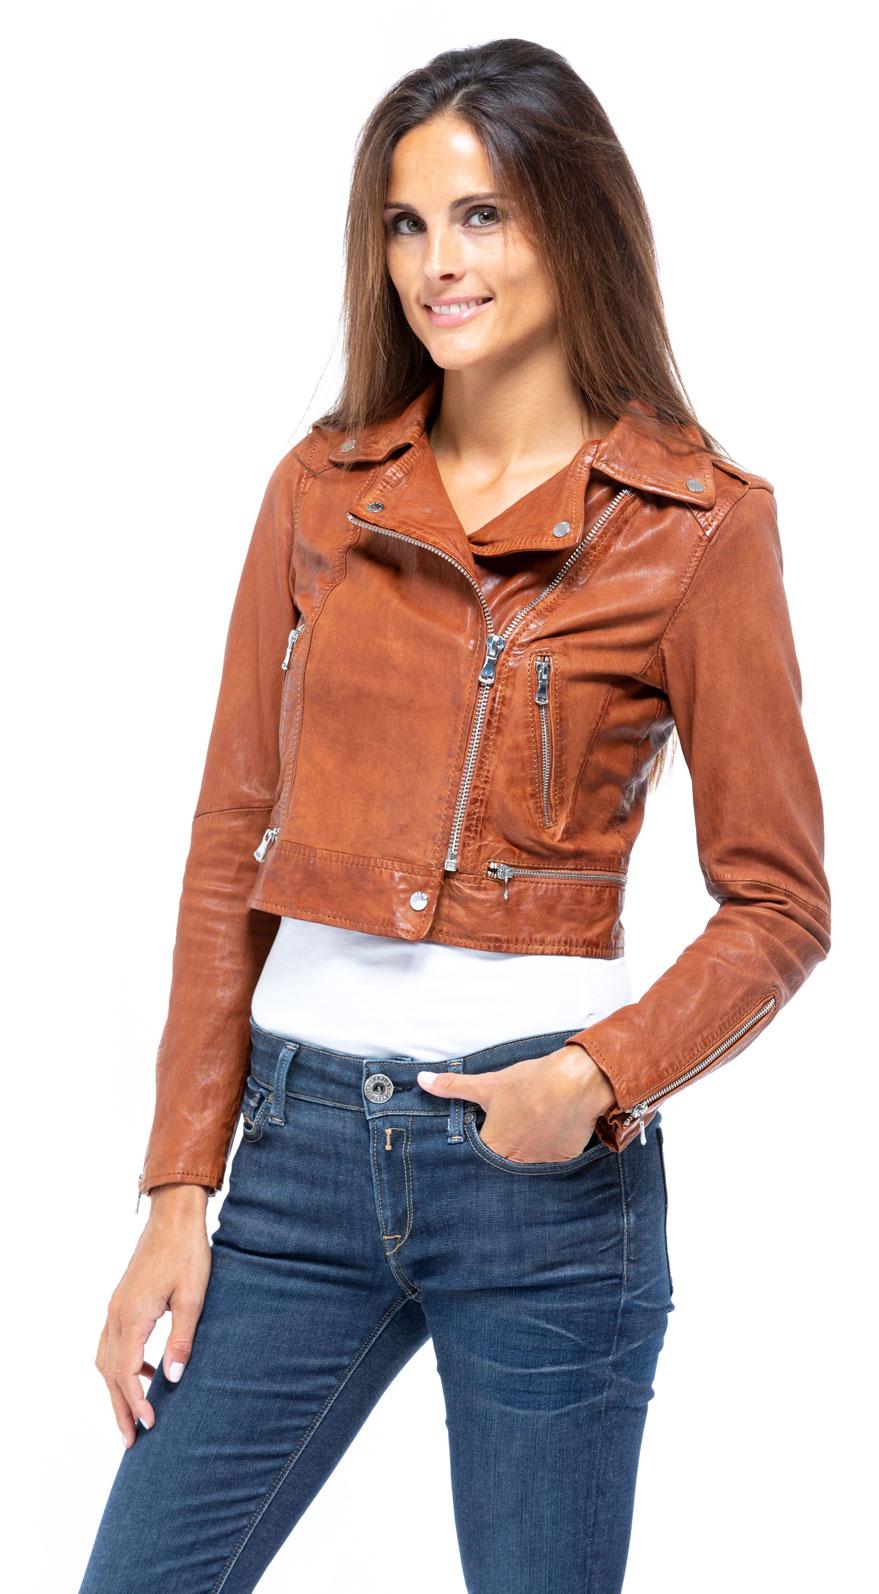 0068b430f blouson cuir femme agneau cognac 62966 oakwood perfecto  mannequin 2  068945500 1659 28092018.jpg